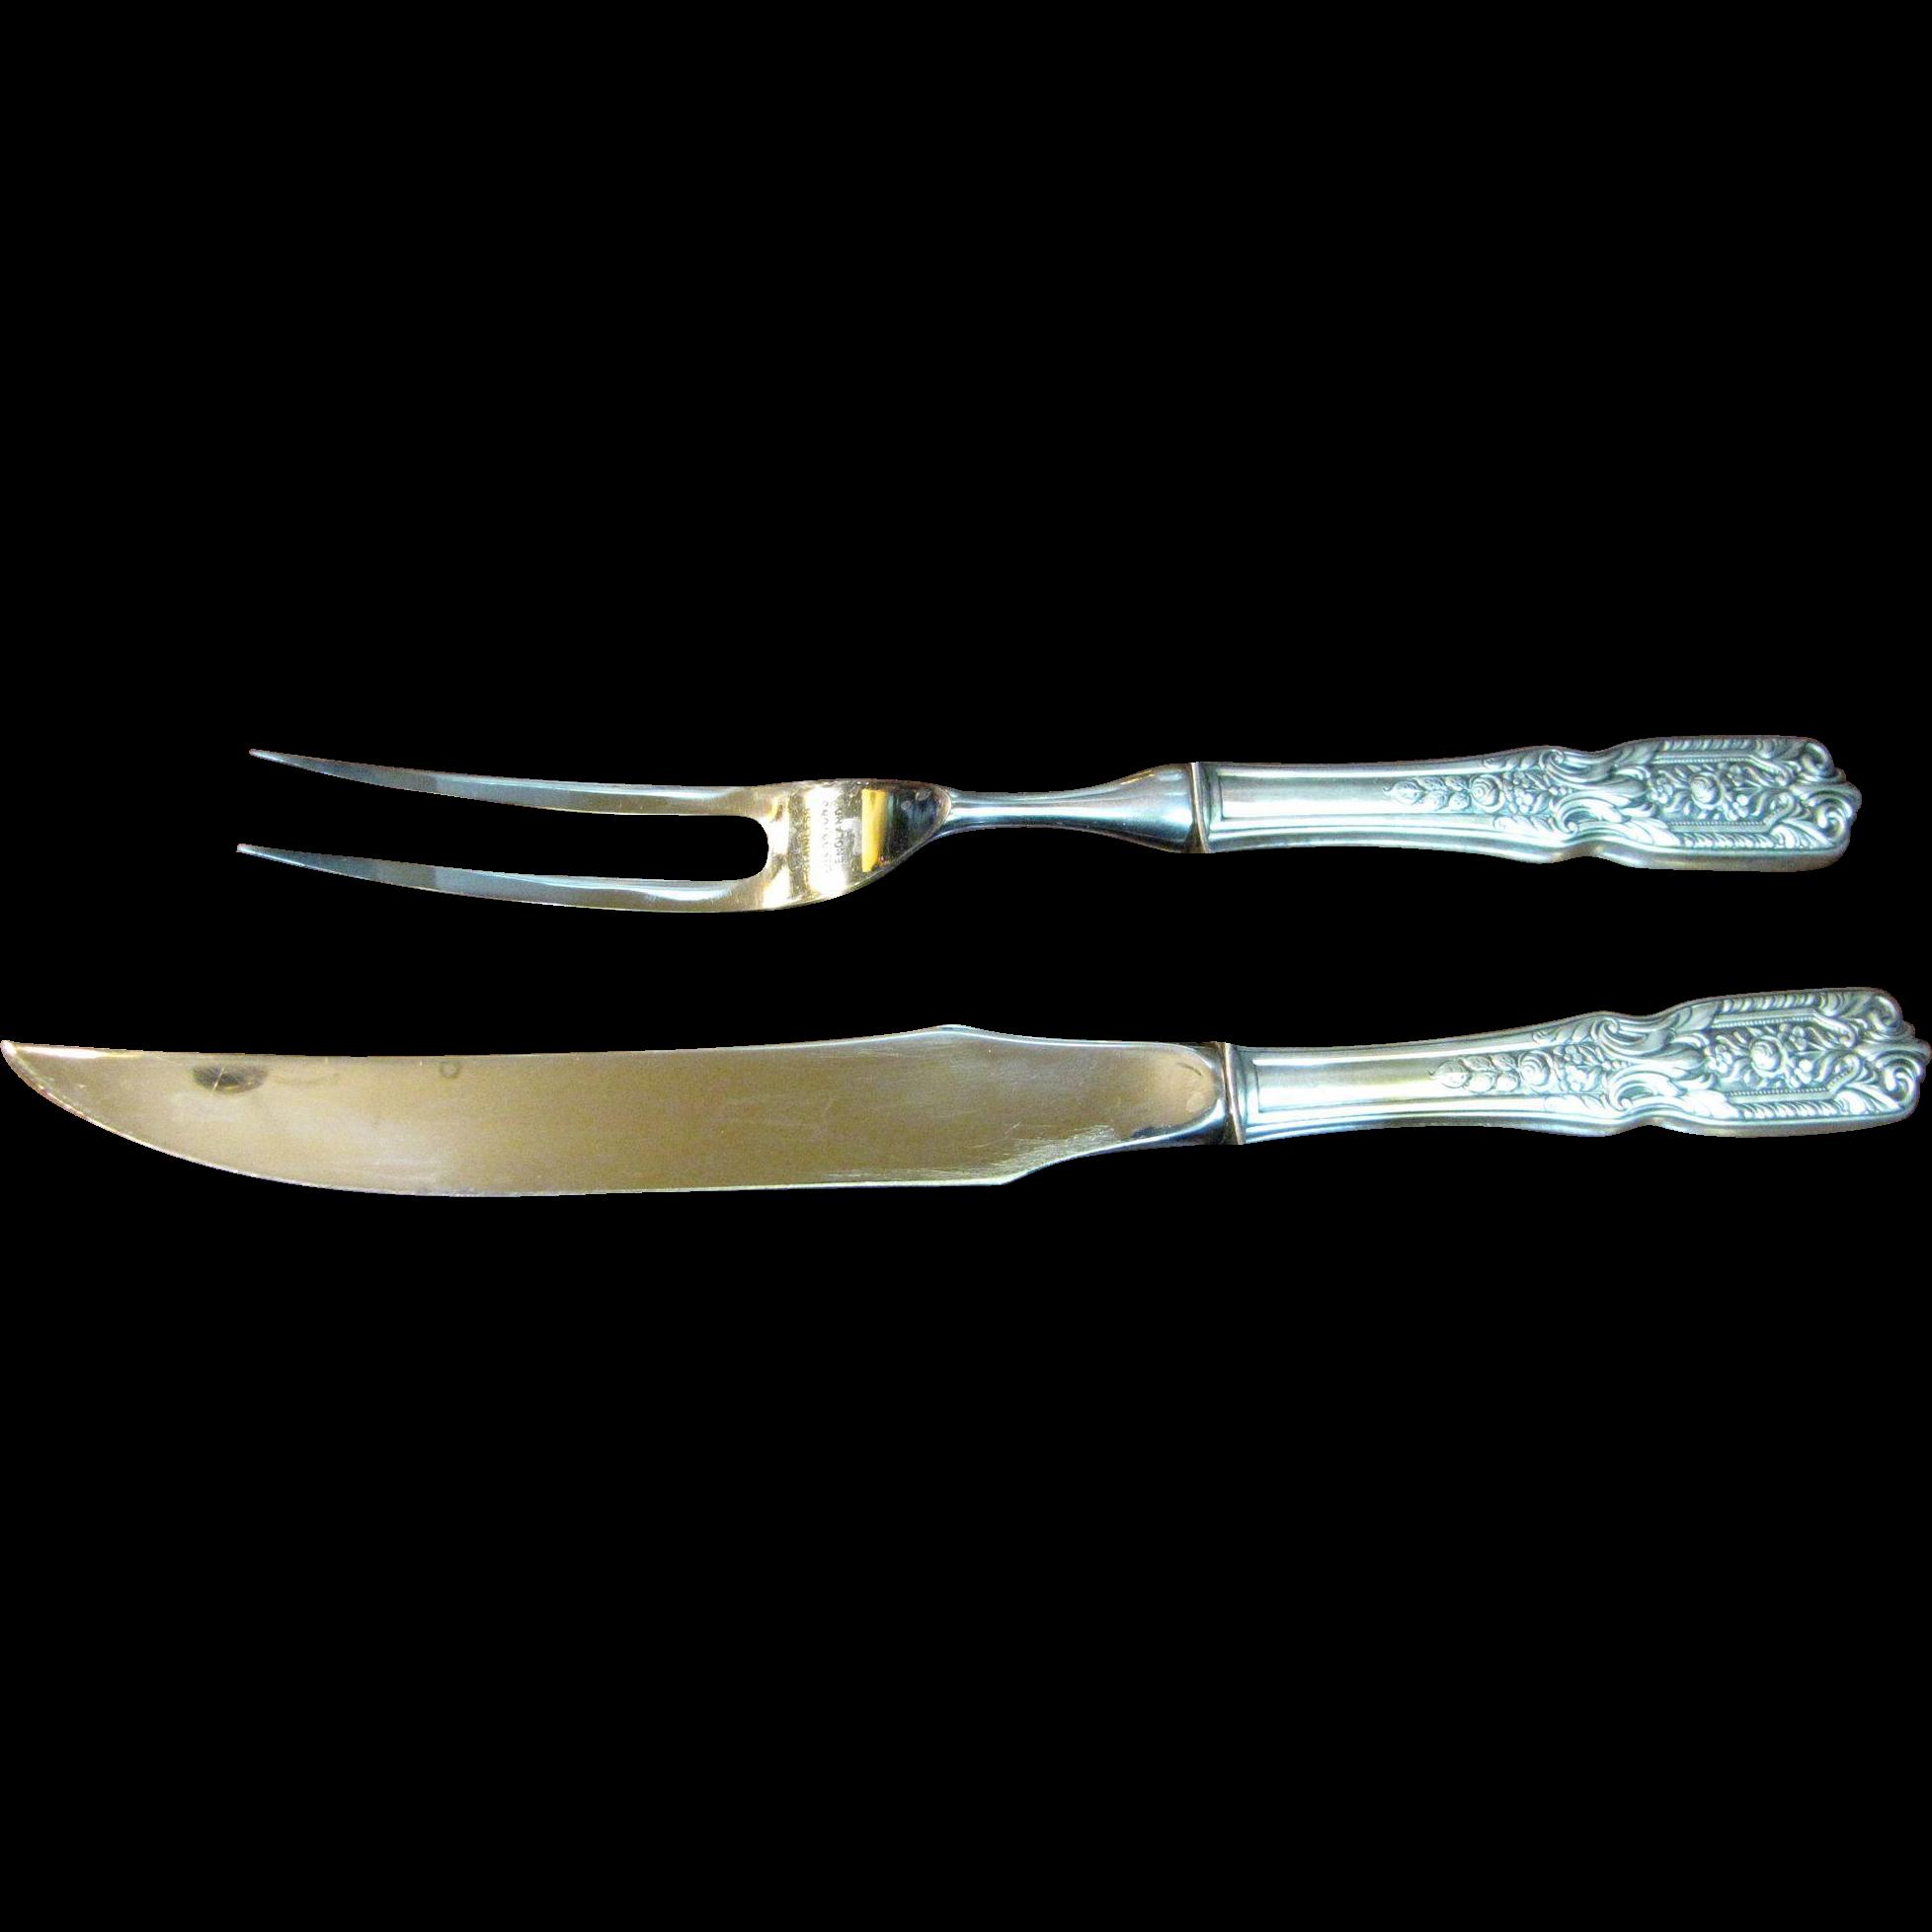 Westmorland quot milburn rose sterling silver carving fork